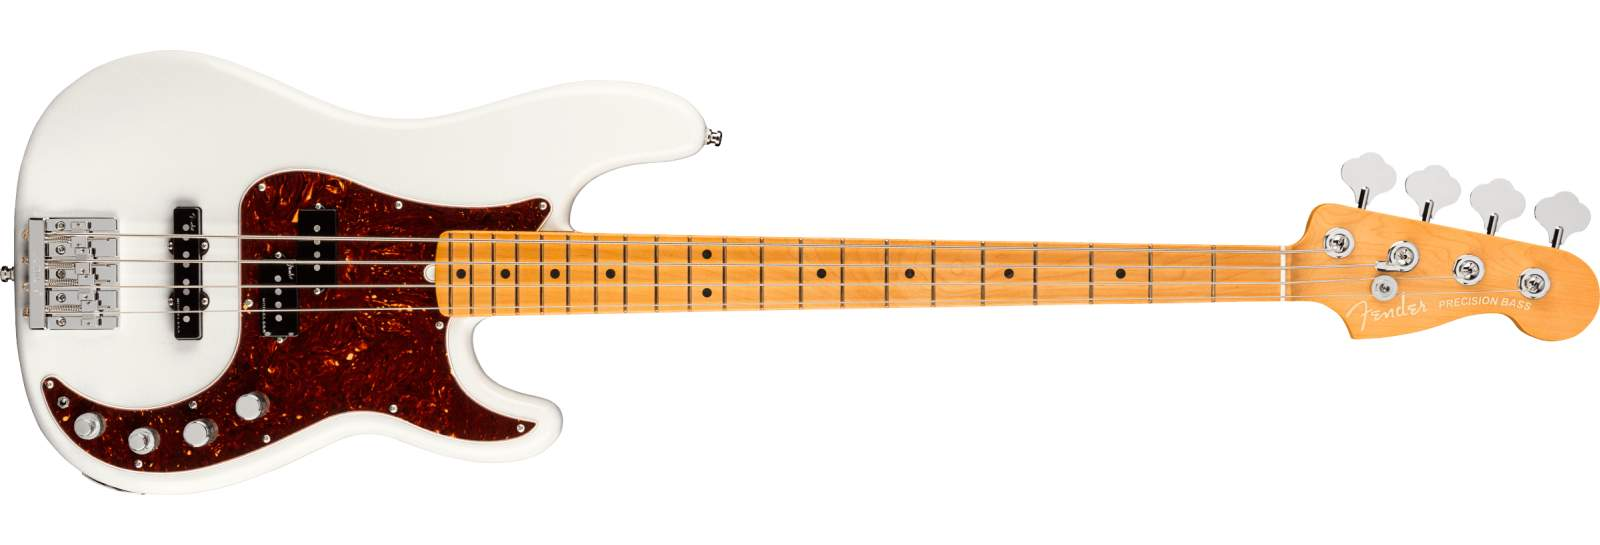 Fender American Ultra P-Bass MN APL